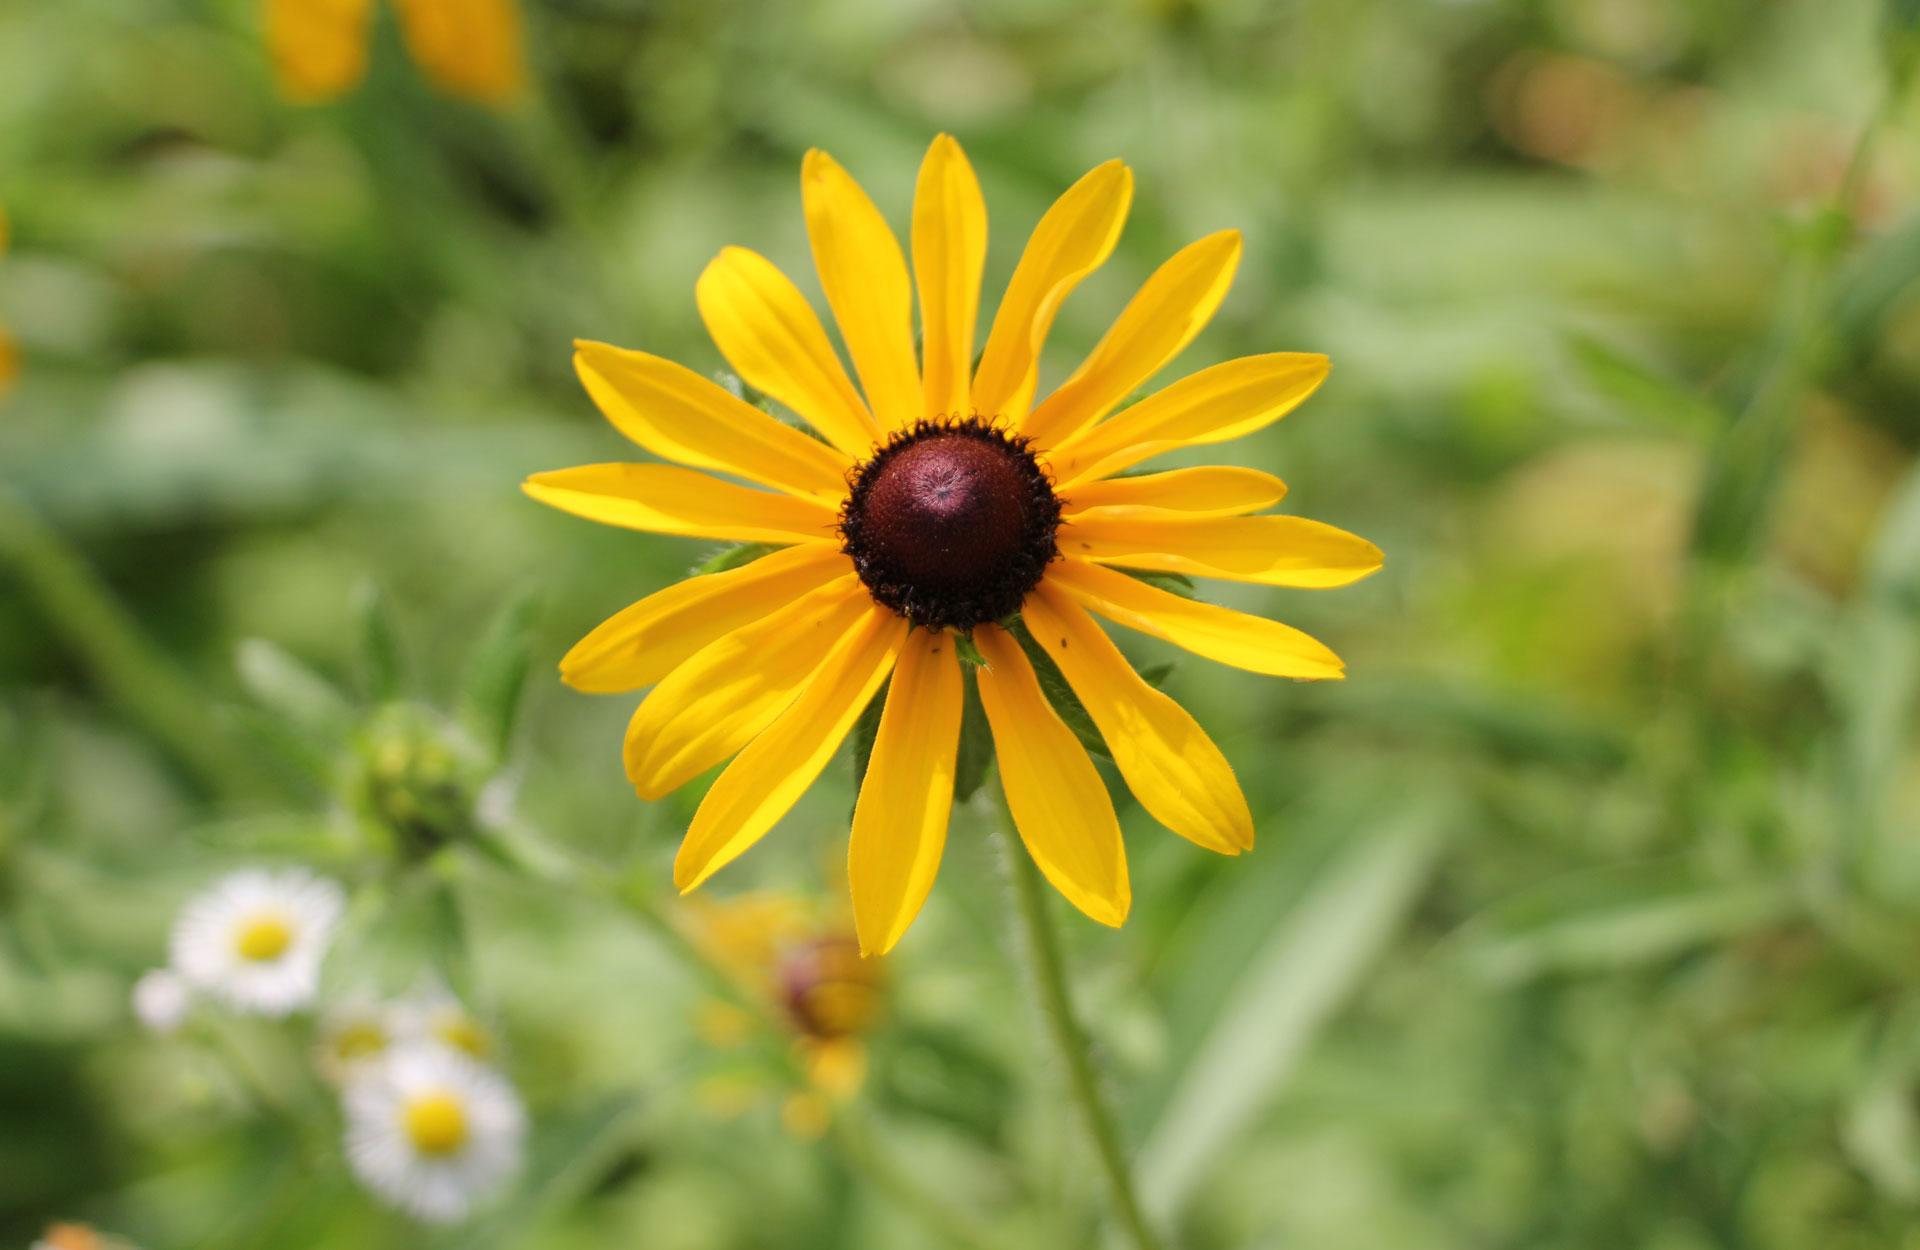 close-up of yellow daisy wildflowers